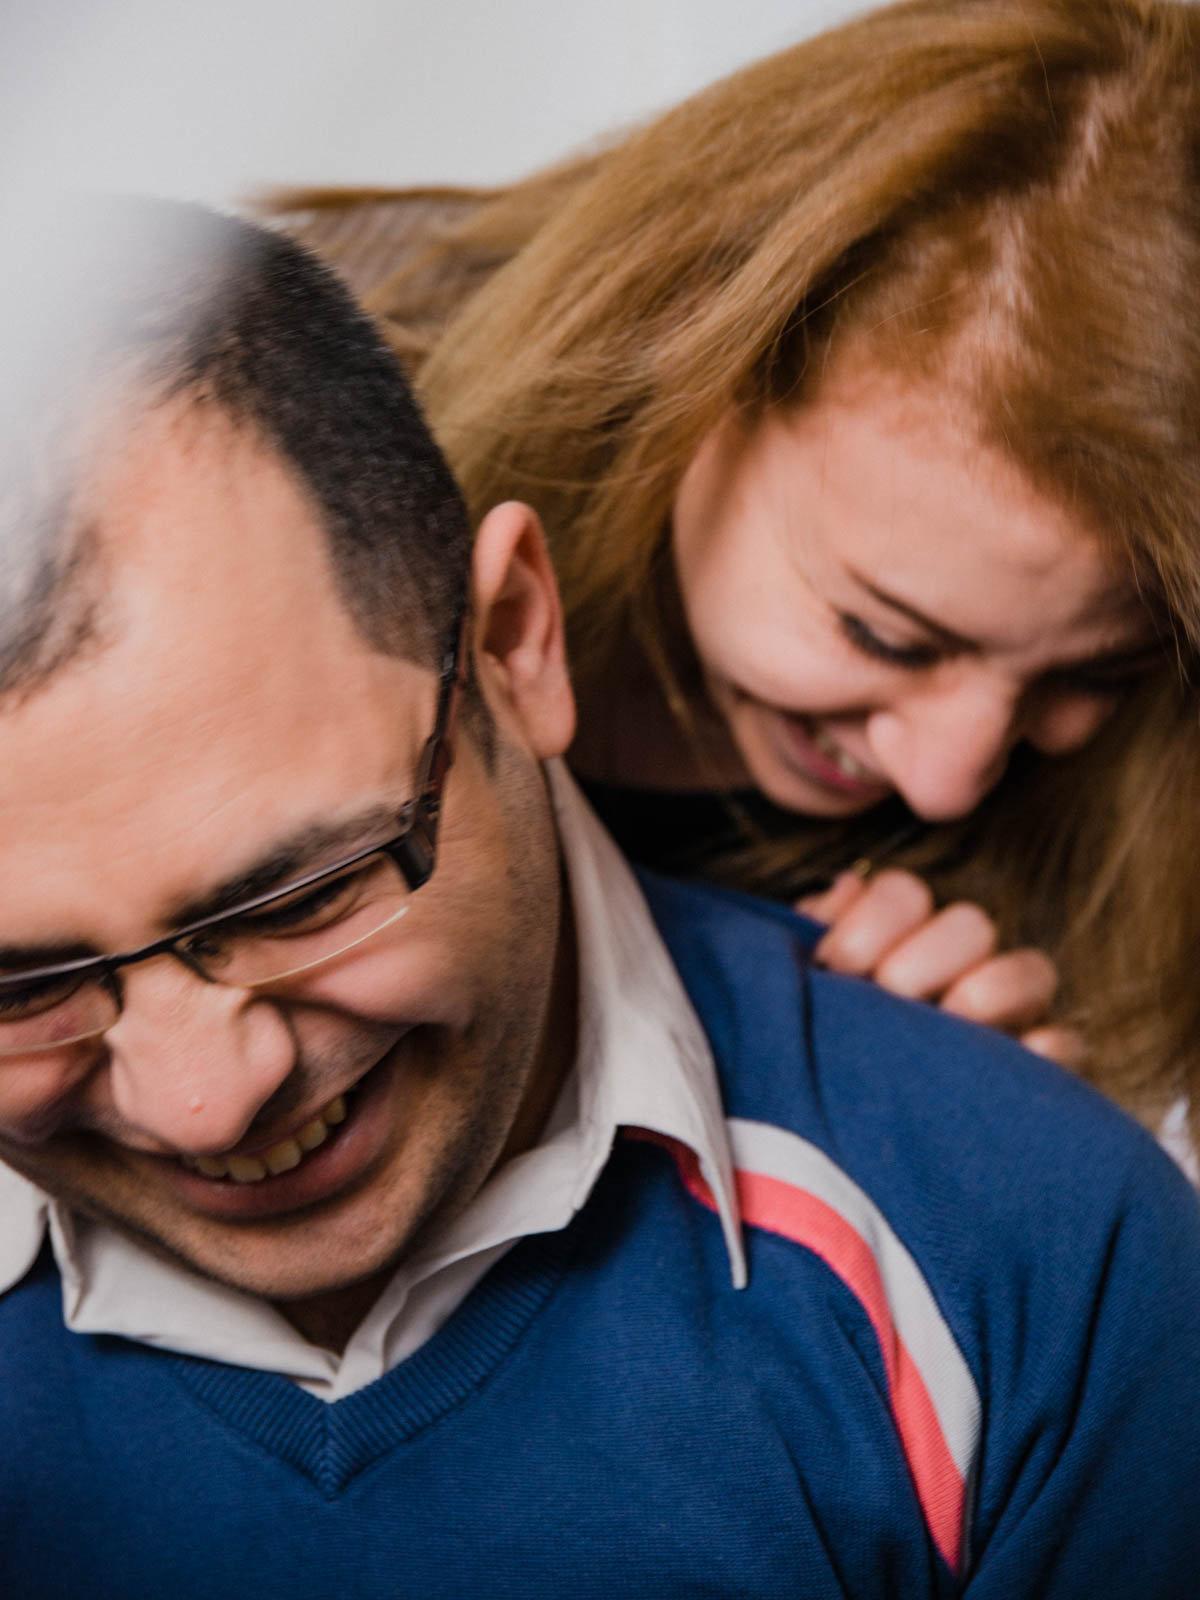 Aziz und Lama, beide lachen (Foto: Christian Protte)